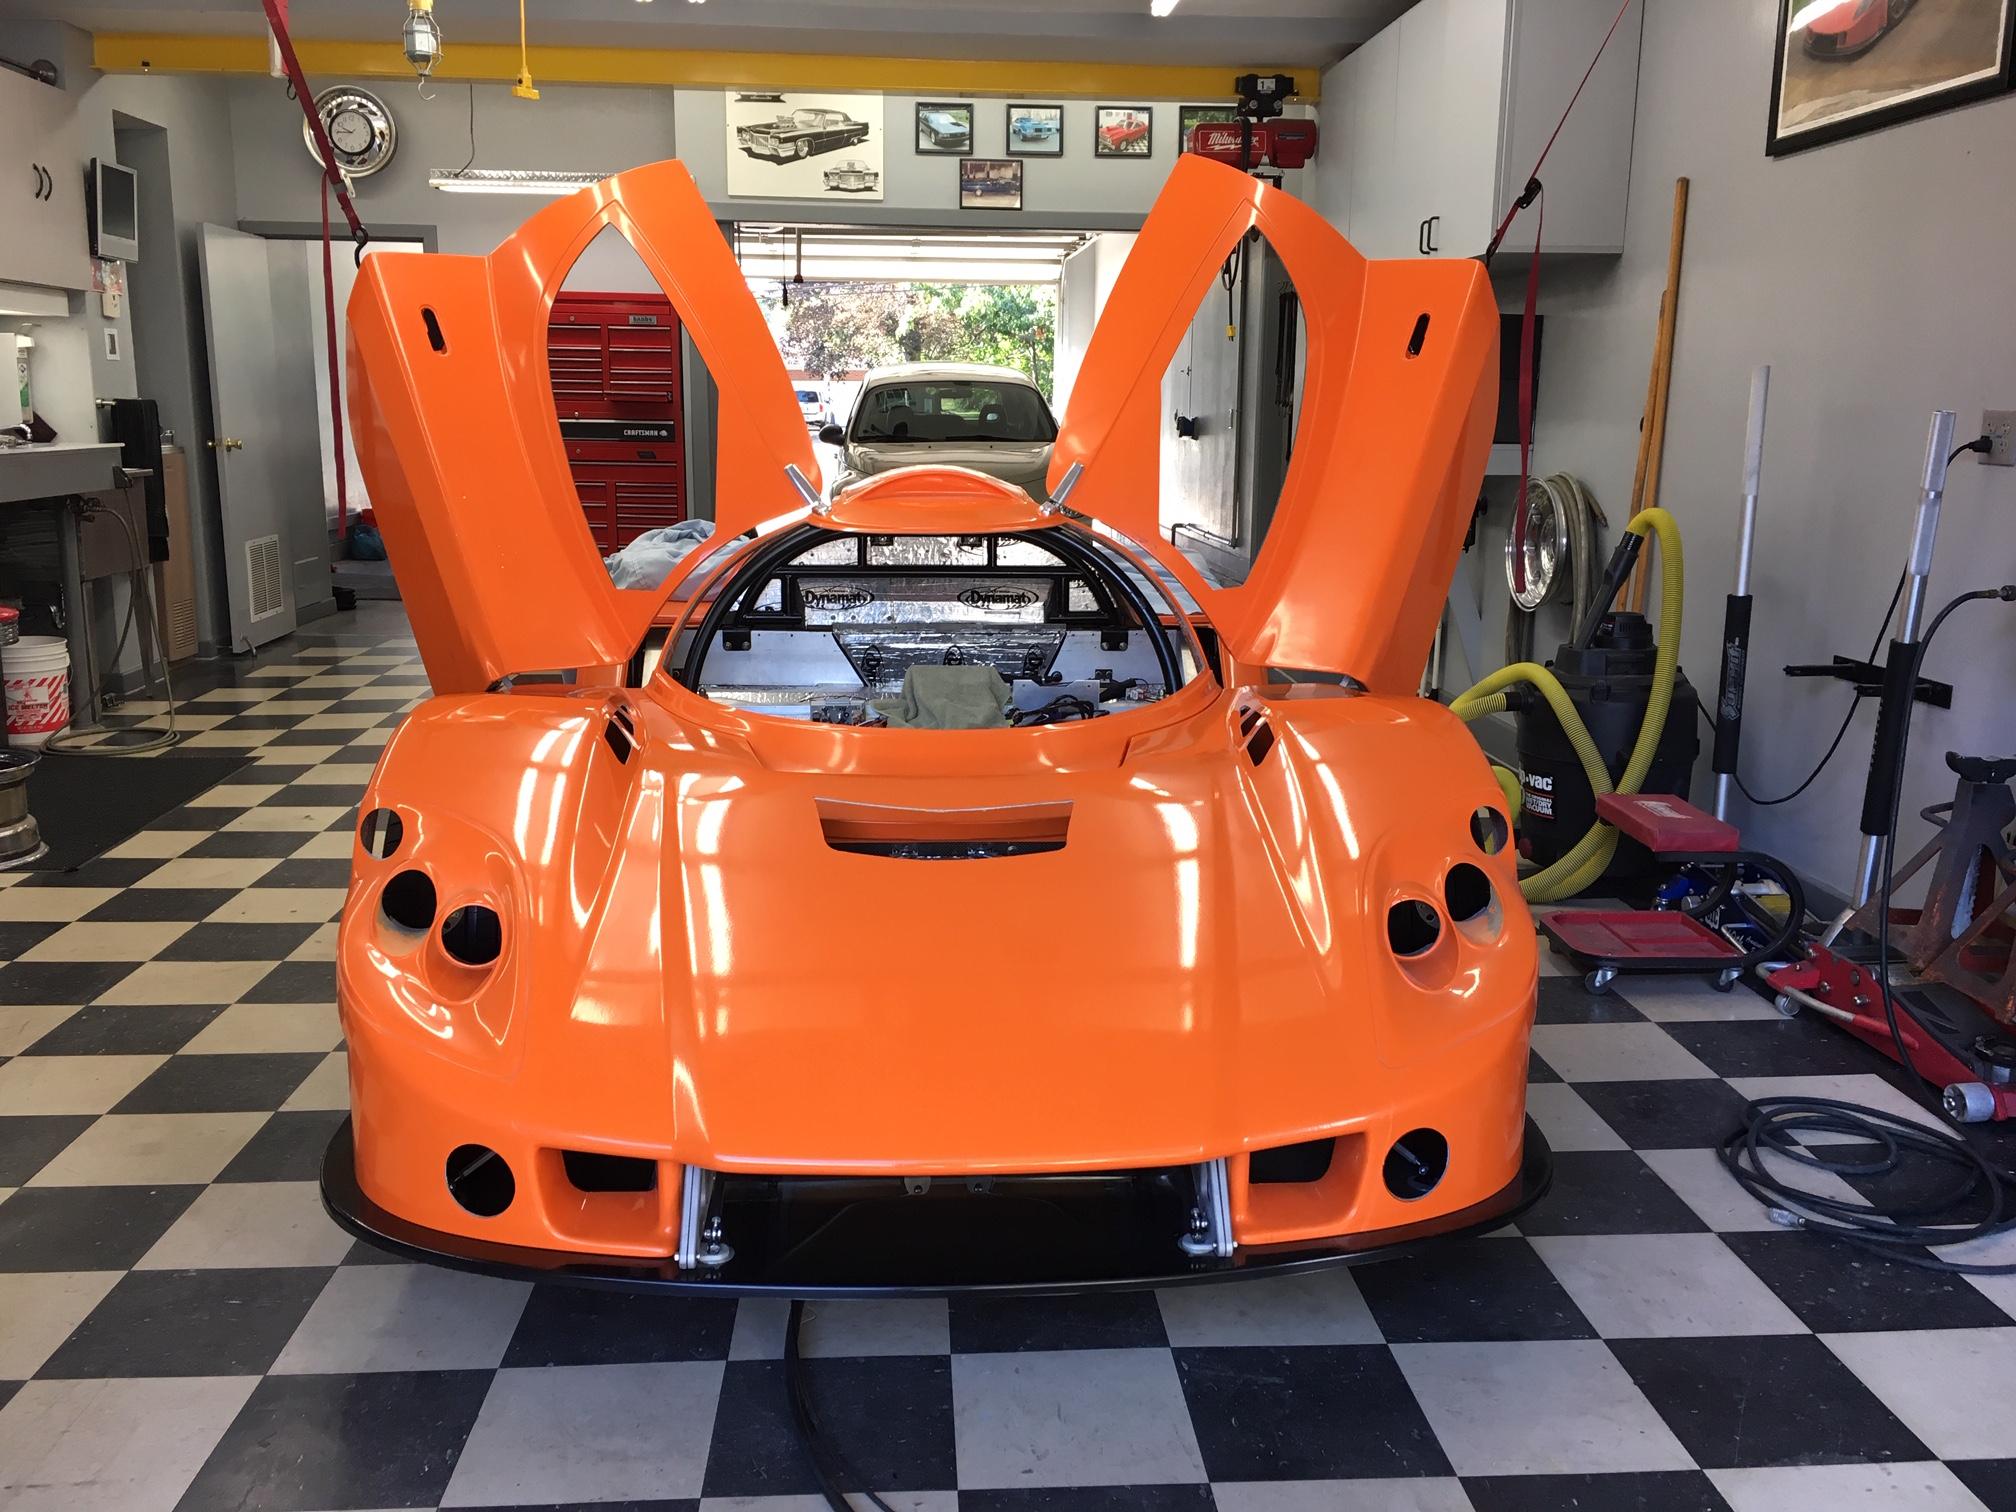 Prototype nose hinge mounted to Bob's car